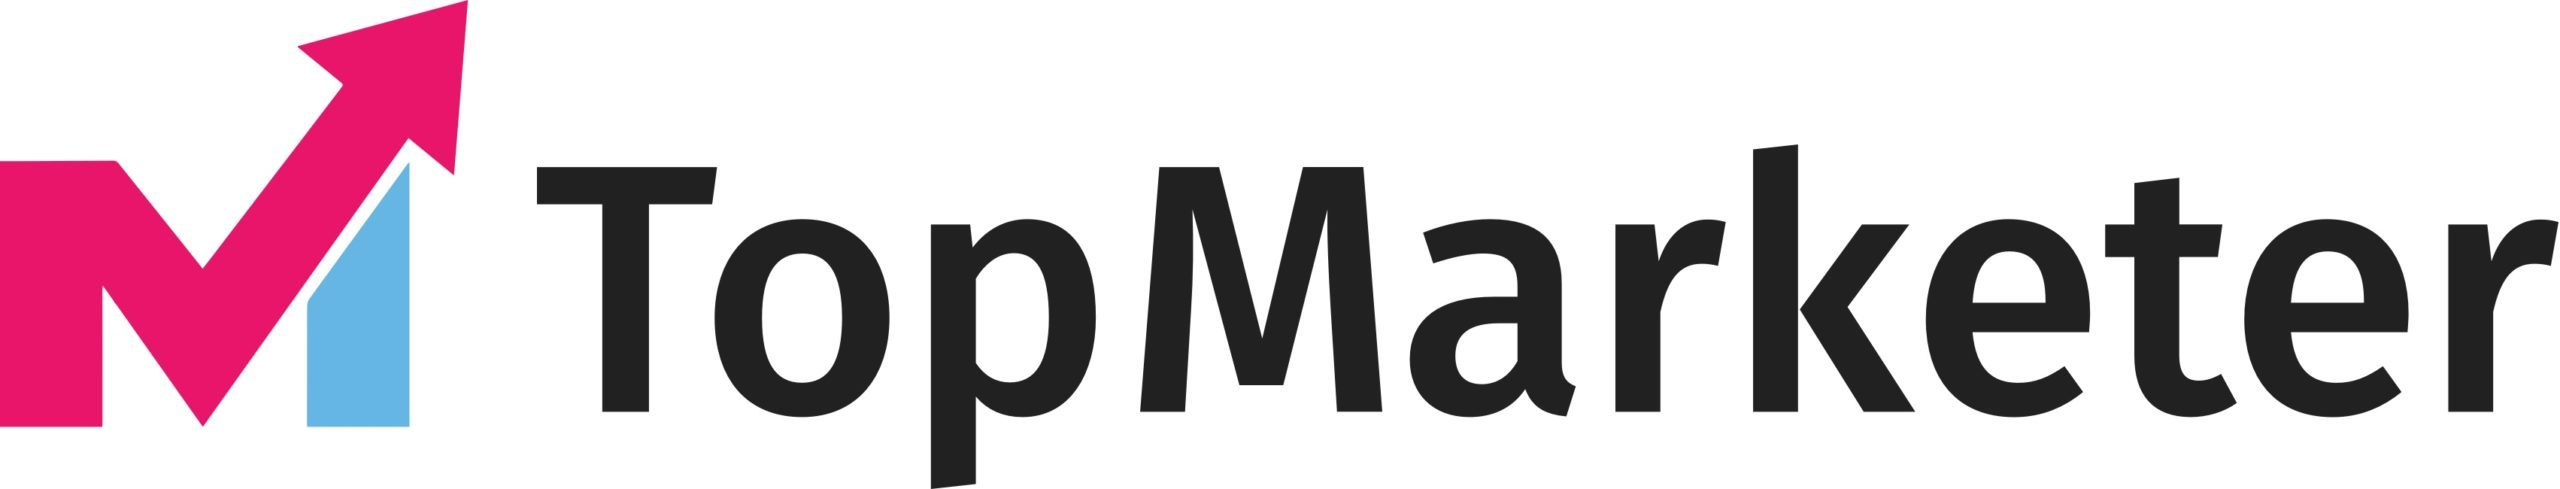 TopMarketer